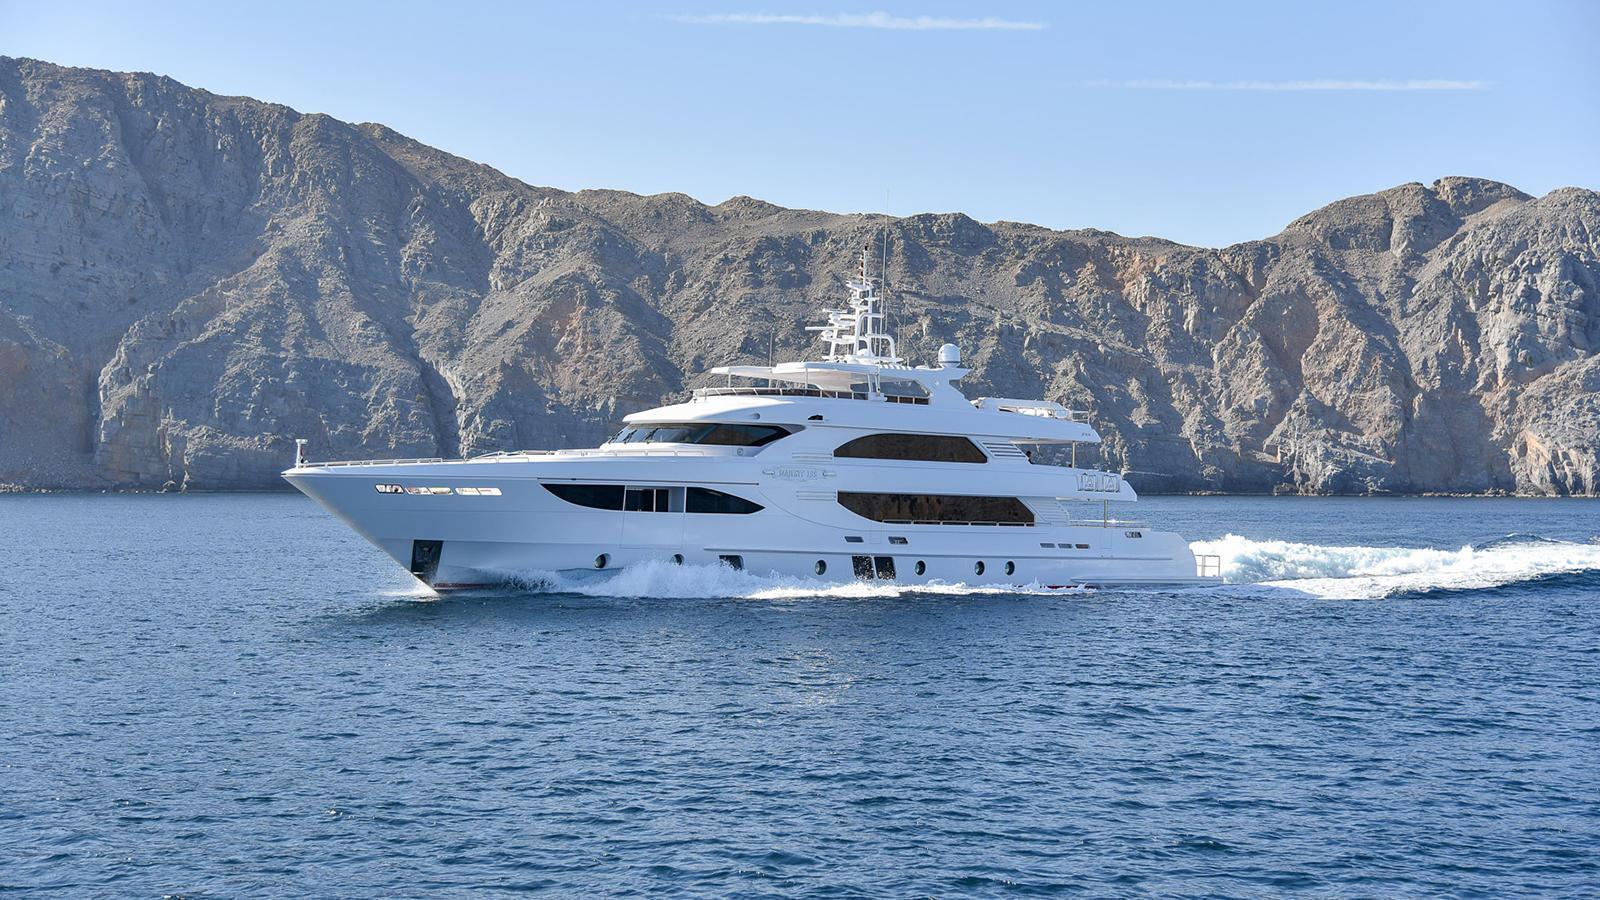 nashwan-motor-yacht-gulfcraft-majesty-135-2016-41m-cruising